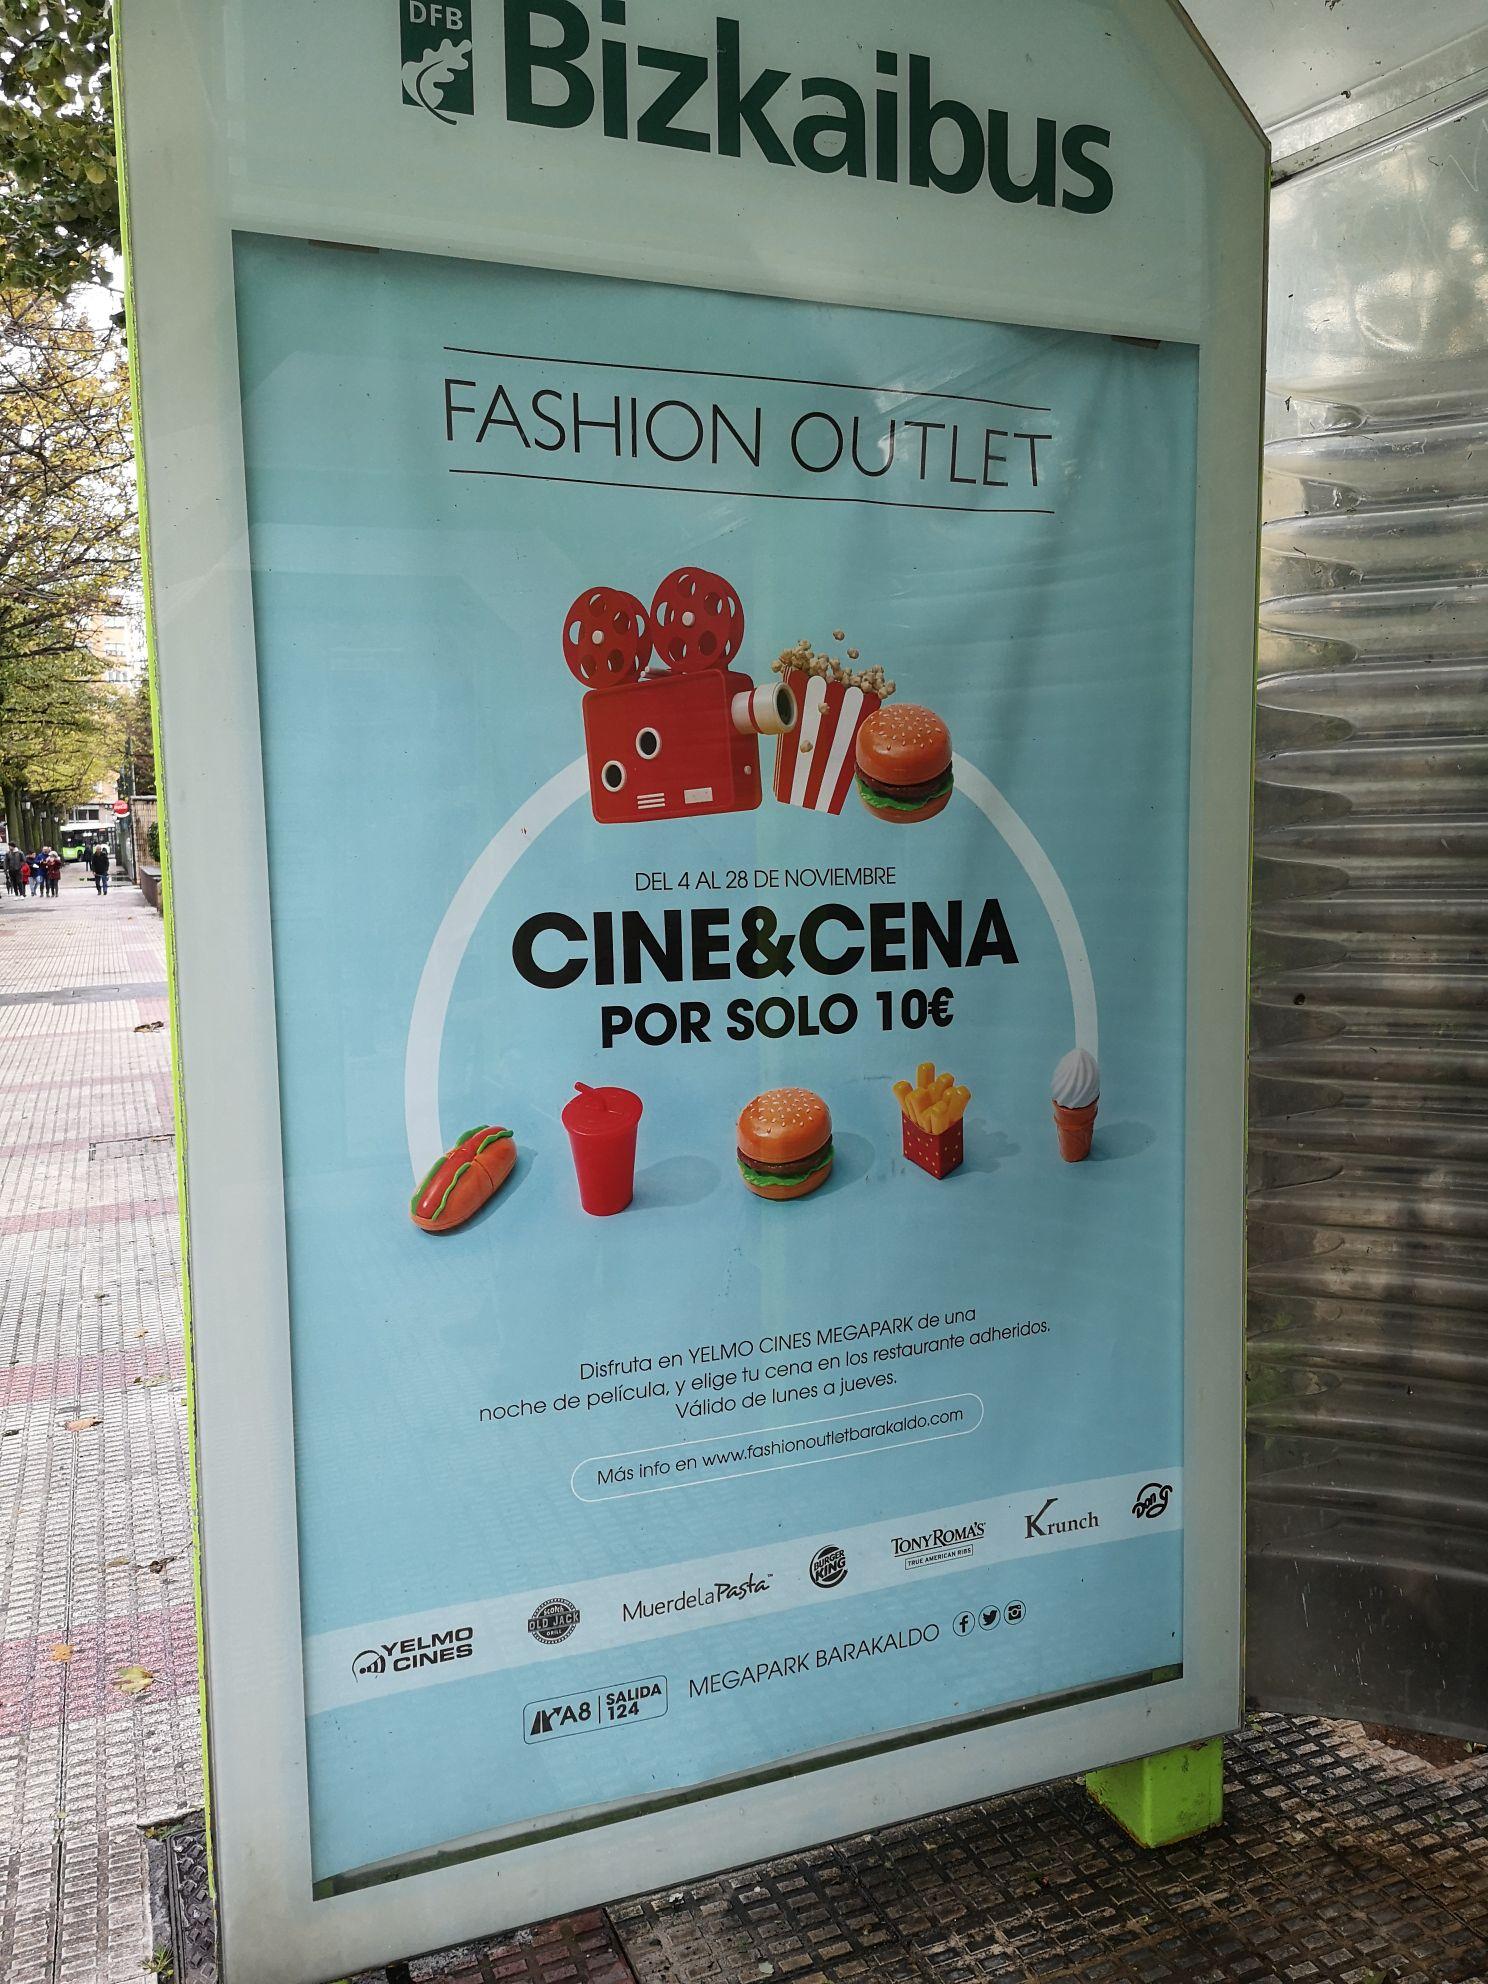 Cine y cena (Fashion outlet de Barakaldo)